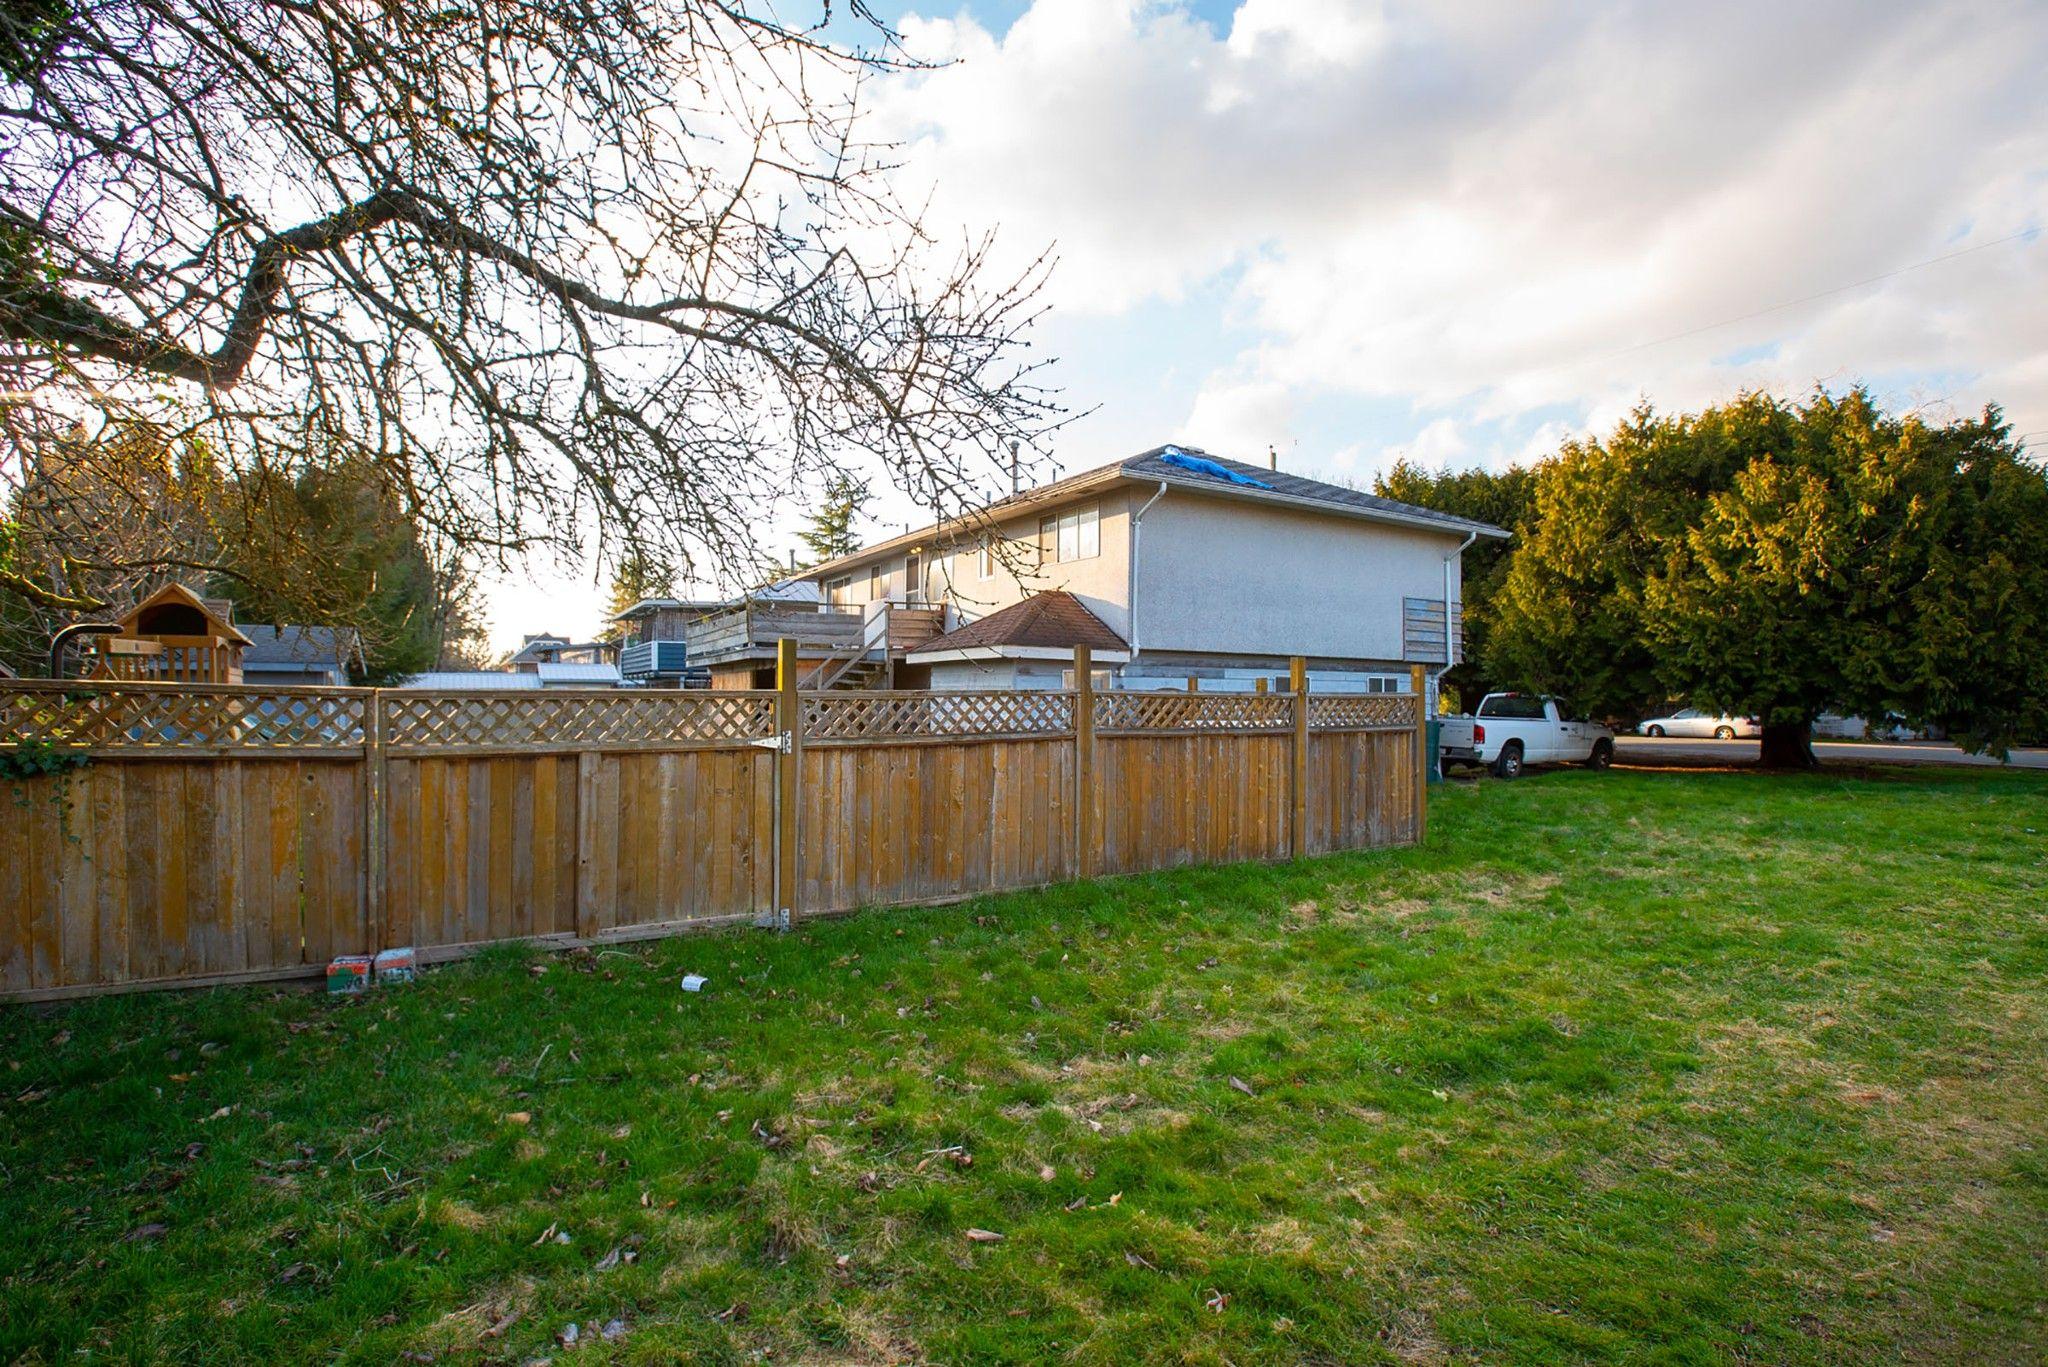 Main Photo: 4892 44B Avenue in Delta: Ladner Elementary House for sale (Ladner)  : MLS®# R2549937